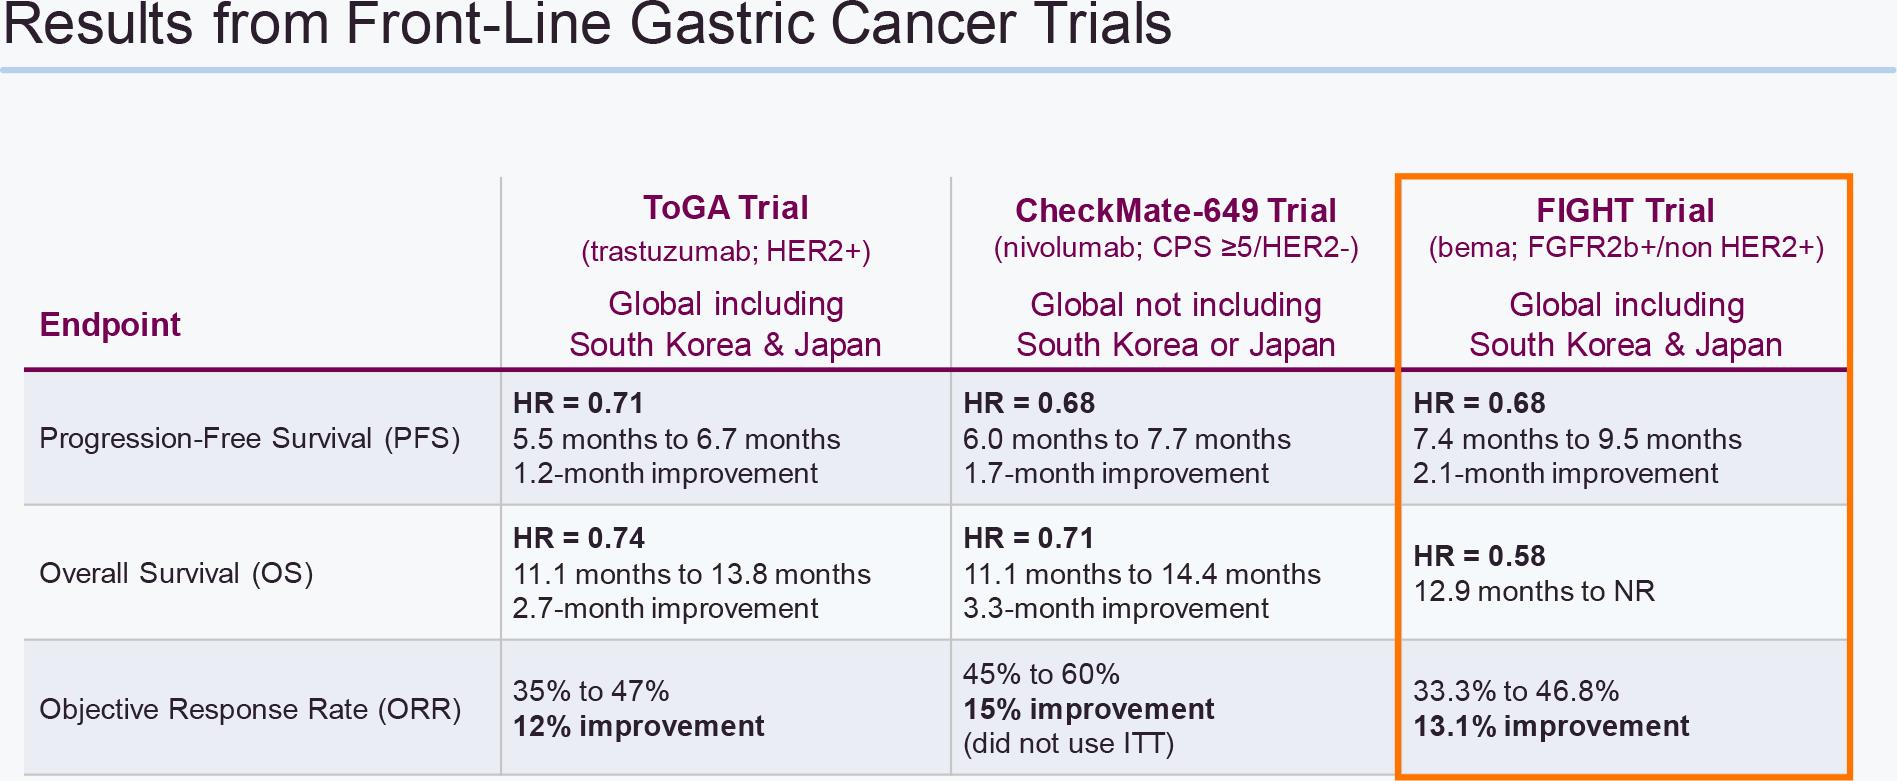 nct03694522 results 02 - Бемаритузумаб: прорыв в лечении рака желудка